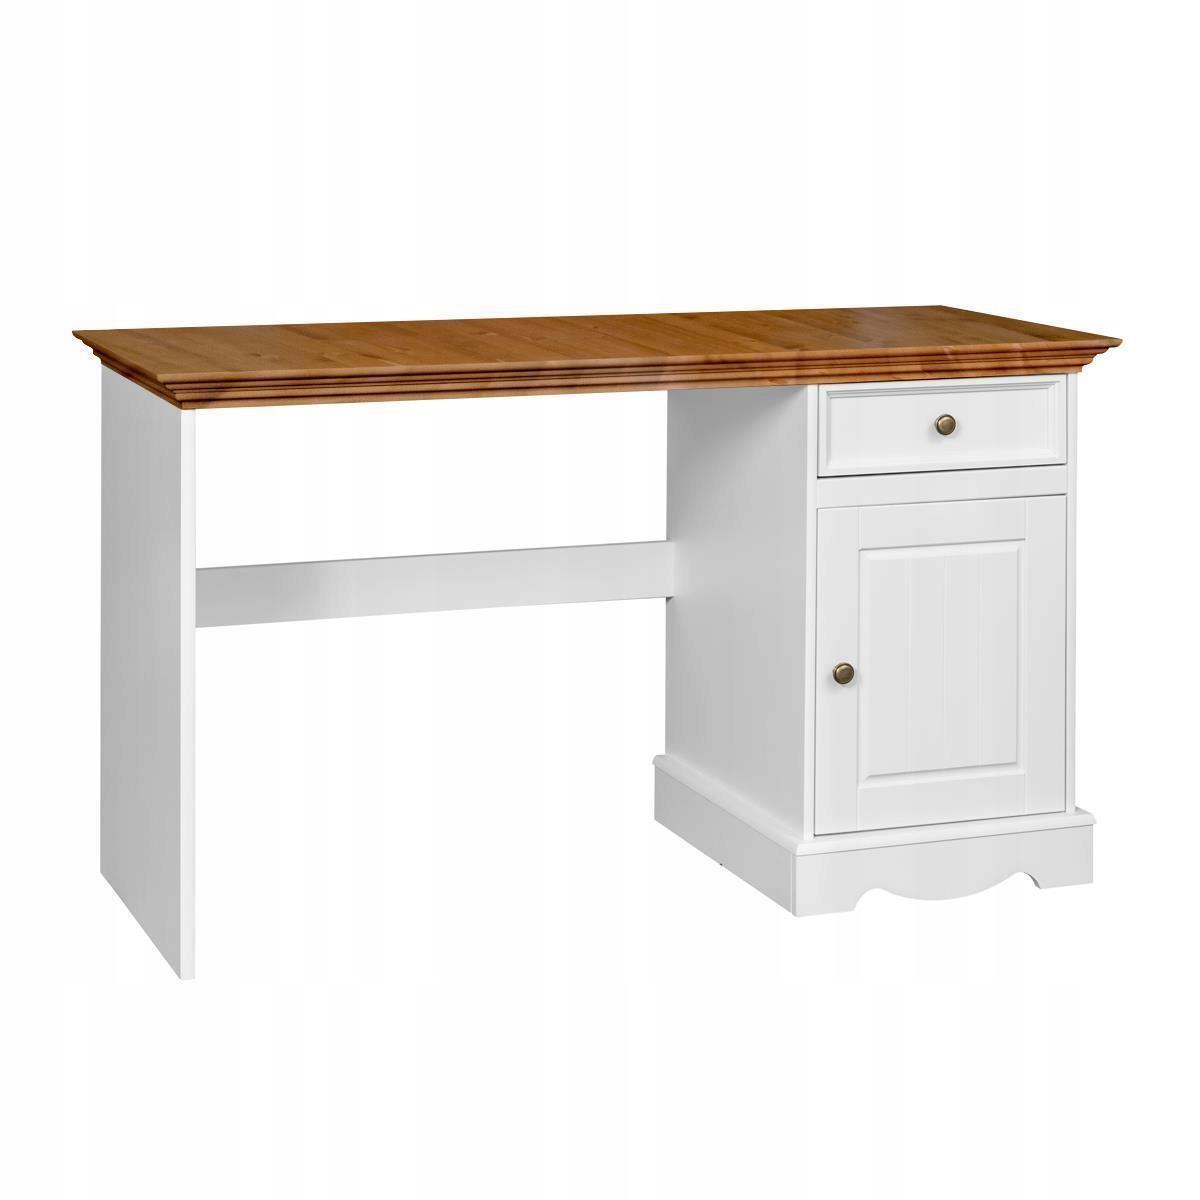 Stôl malé drevené Belluno Elegante PL031B/D